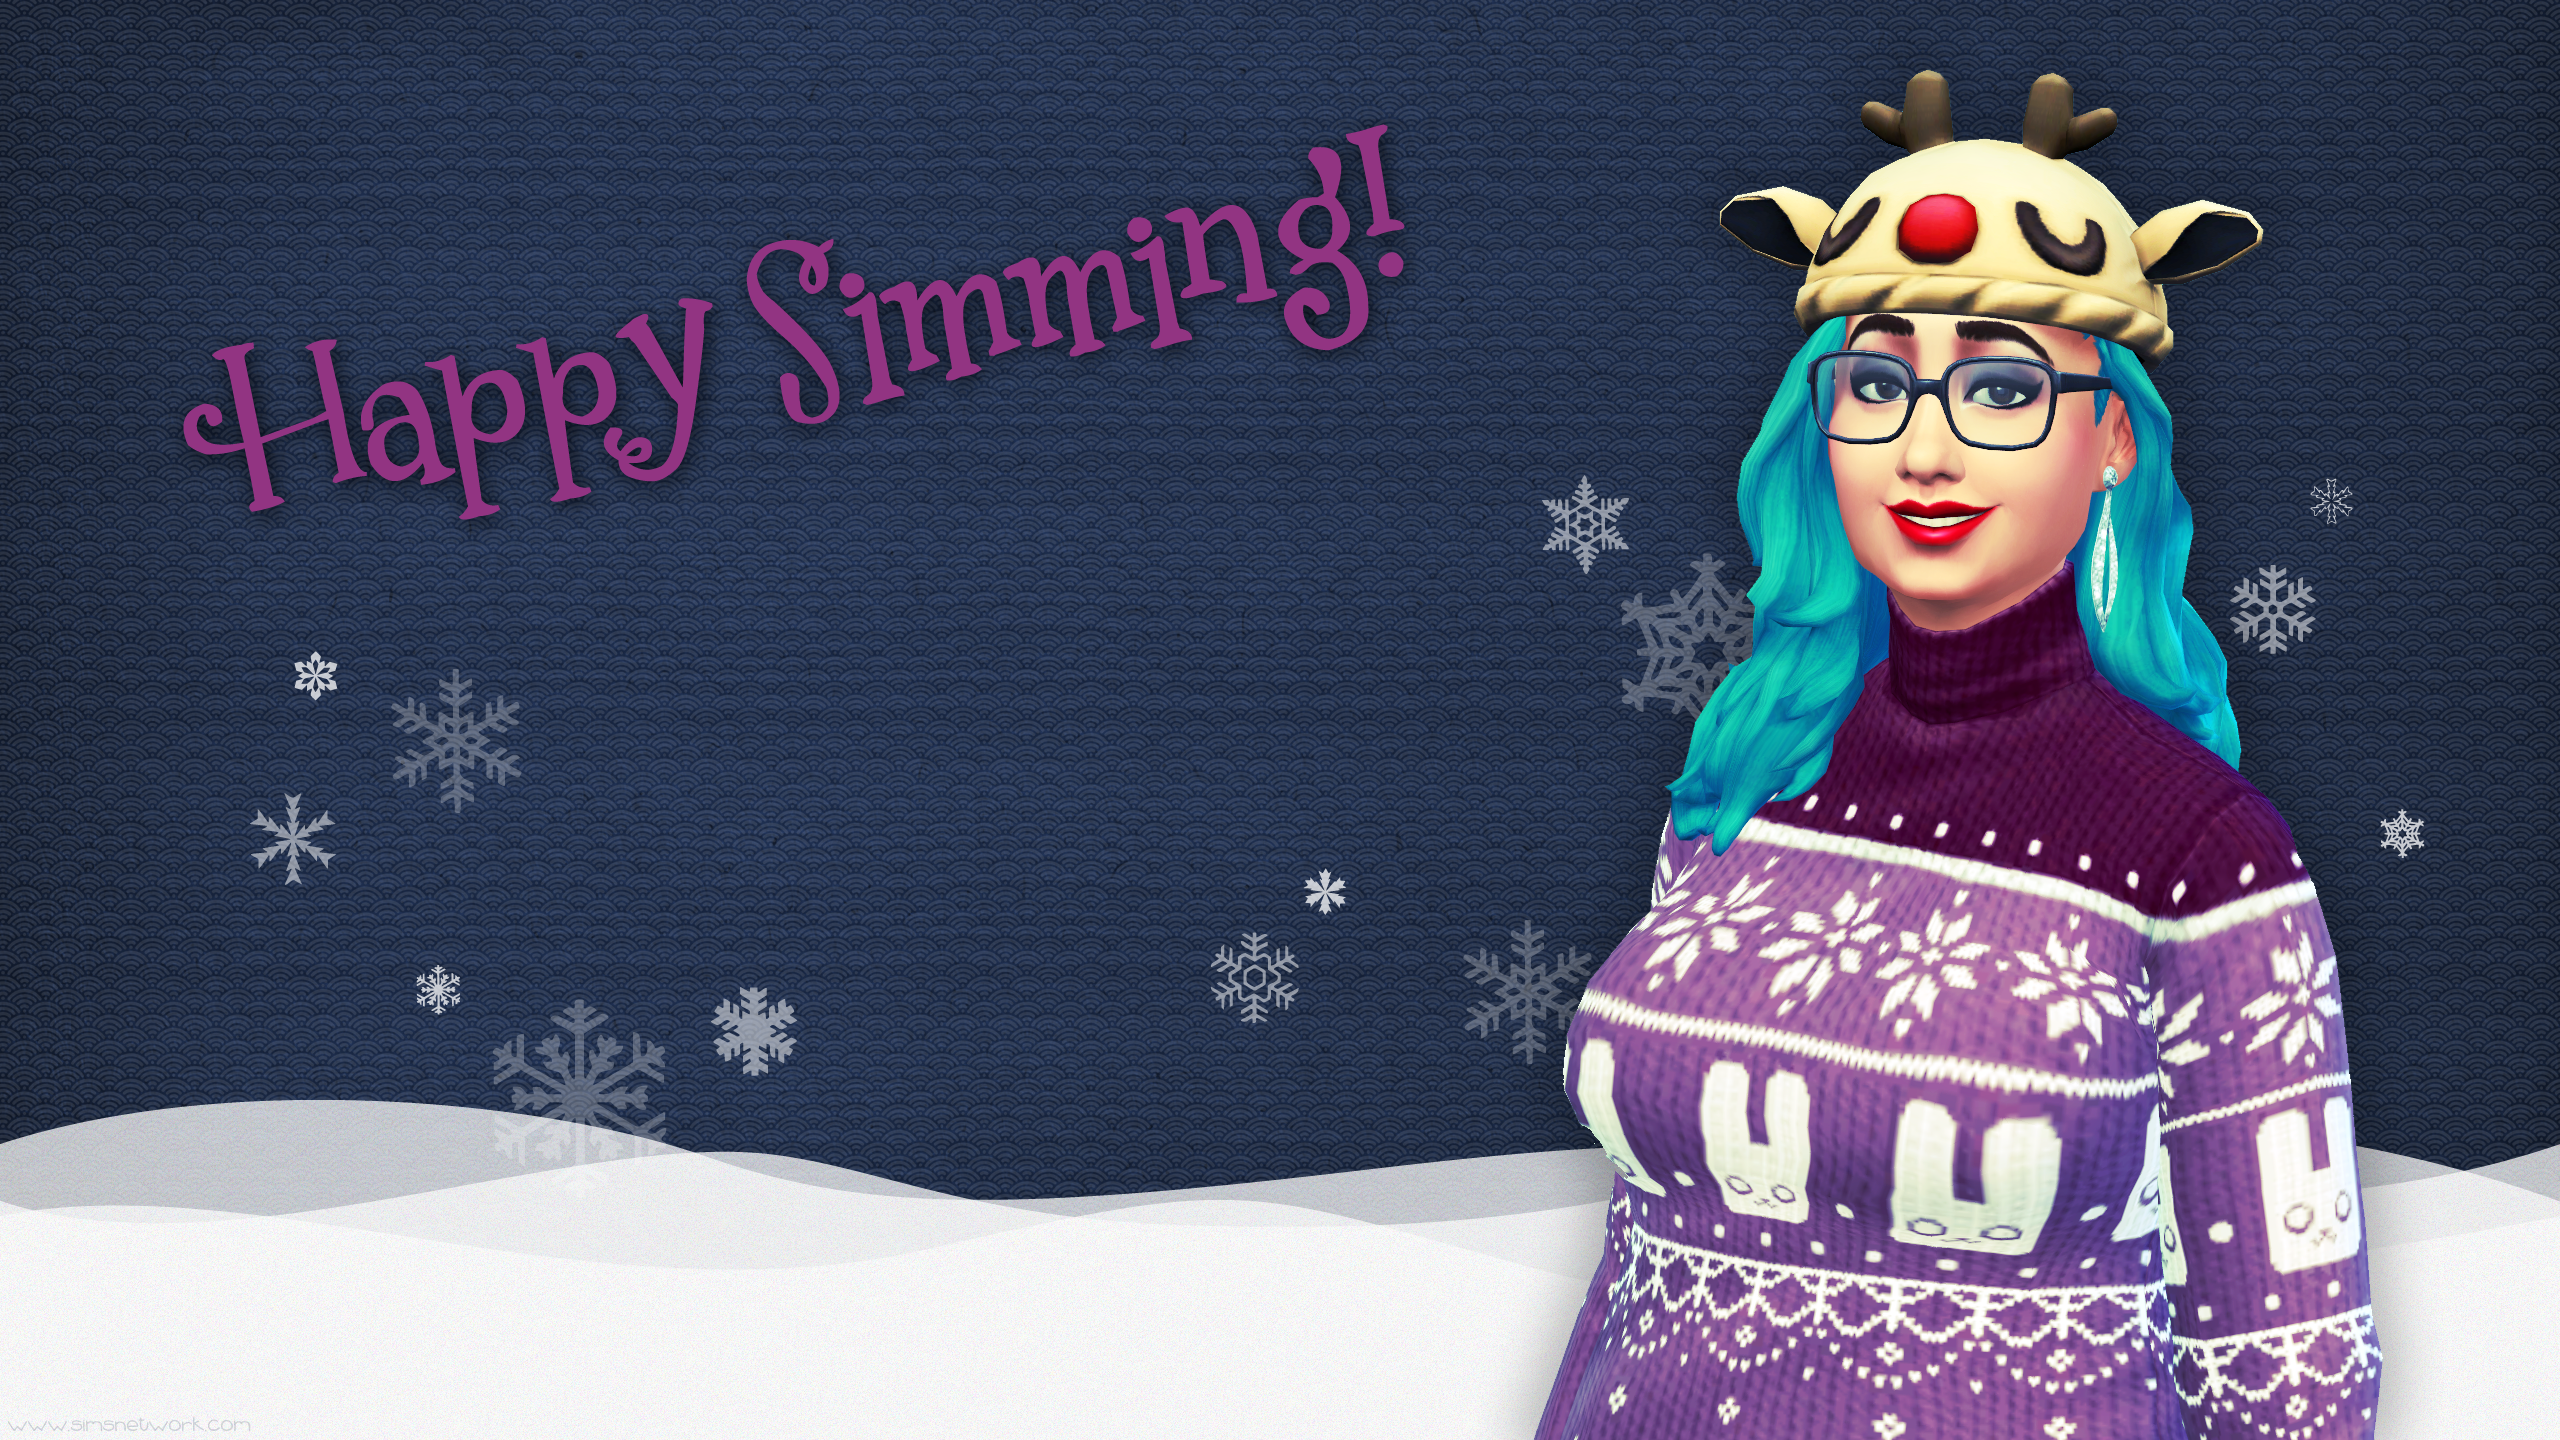 Happy Simming Christmas 2015 wallpaper